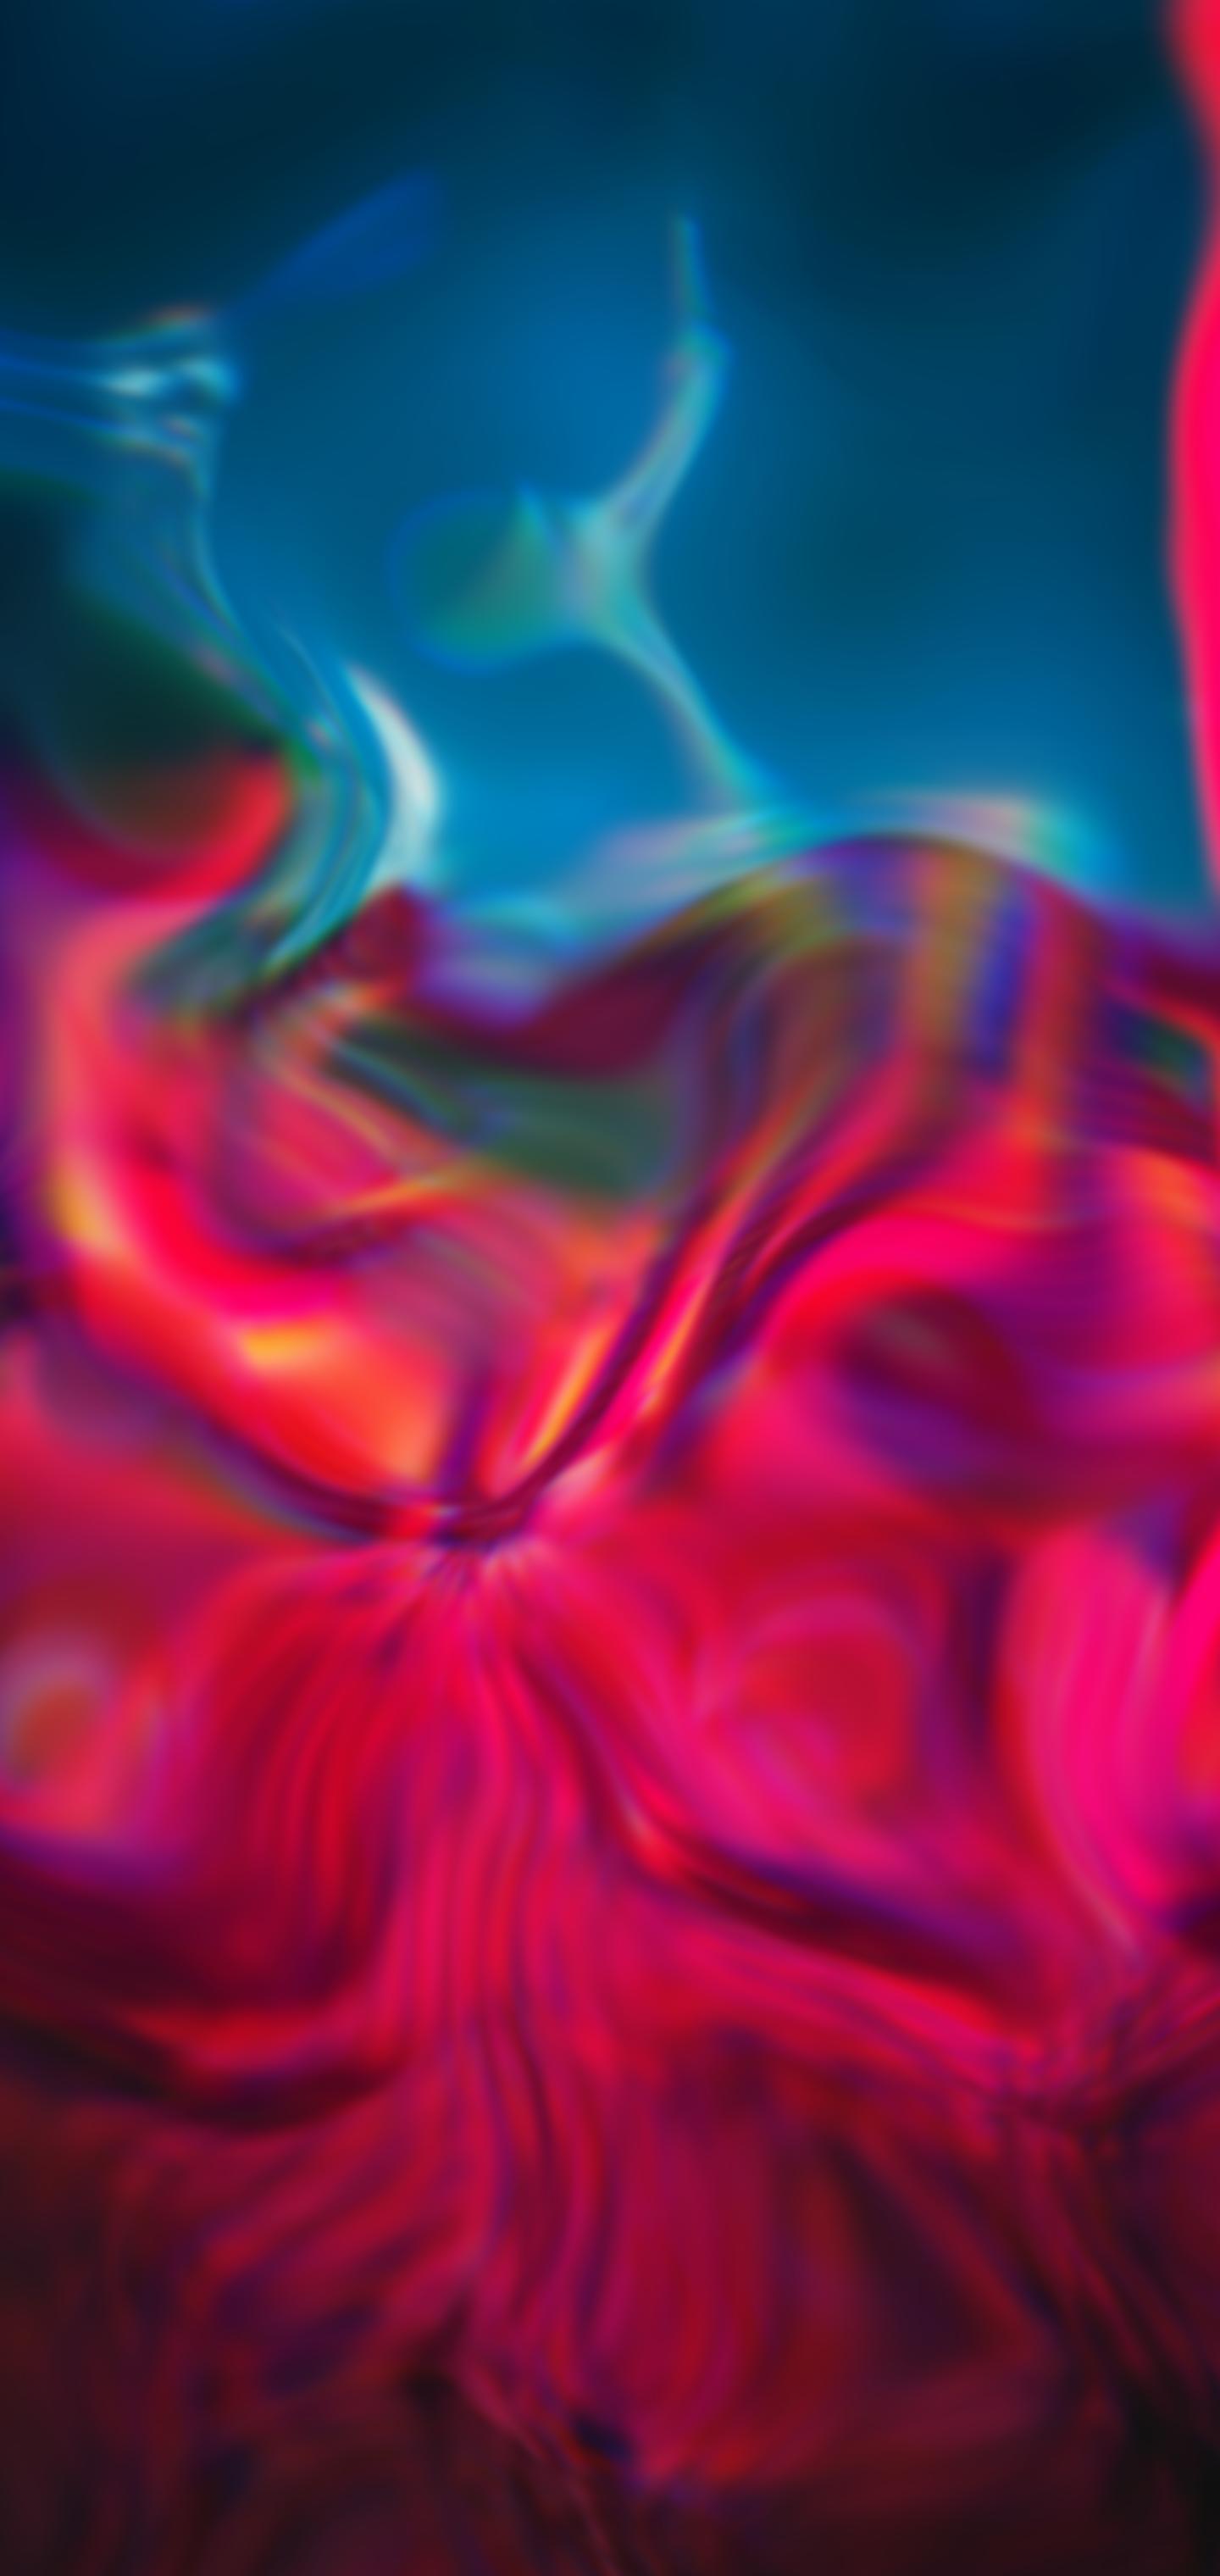 iPhone abstract wallpaper glitch series Marcus Bremen iDownloadBlog v2